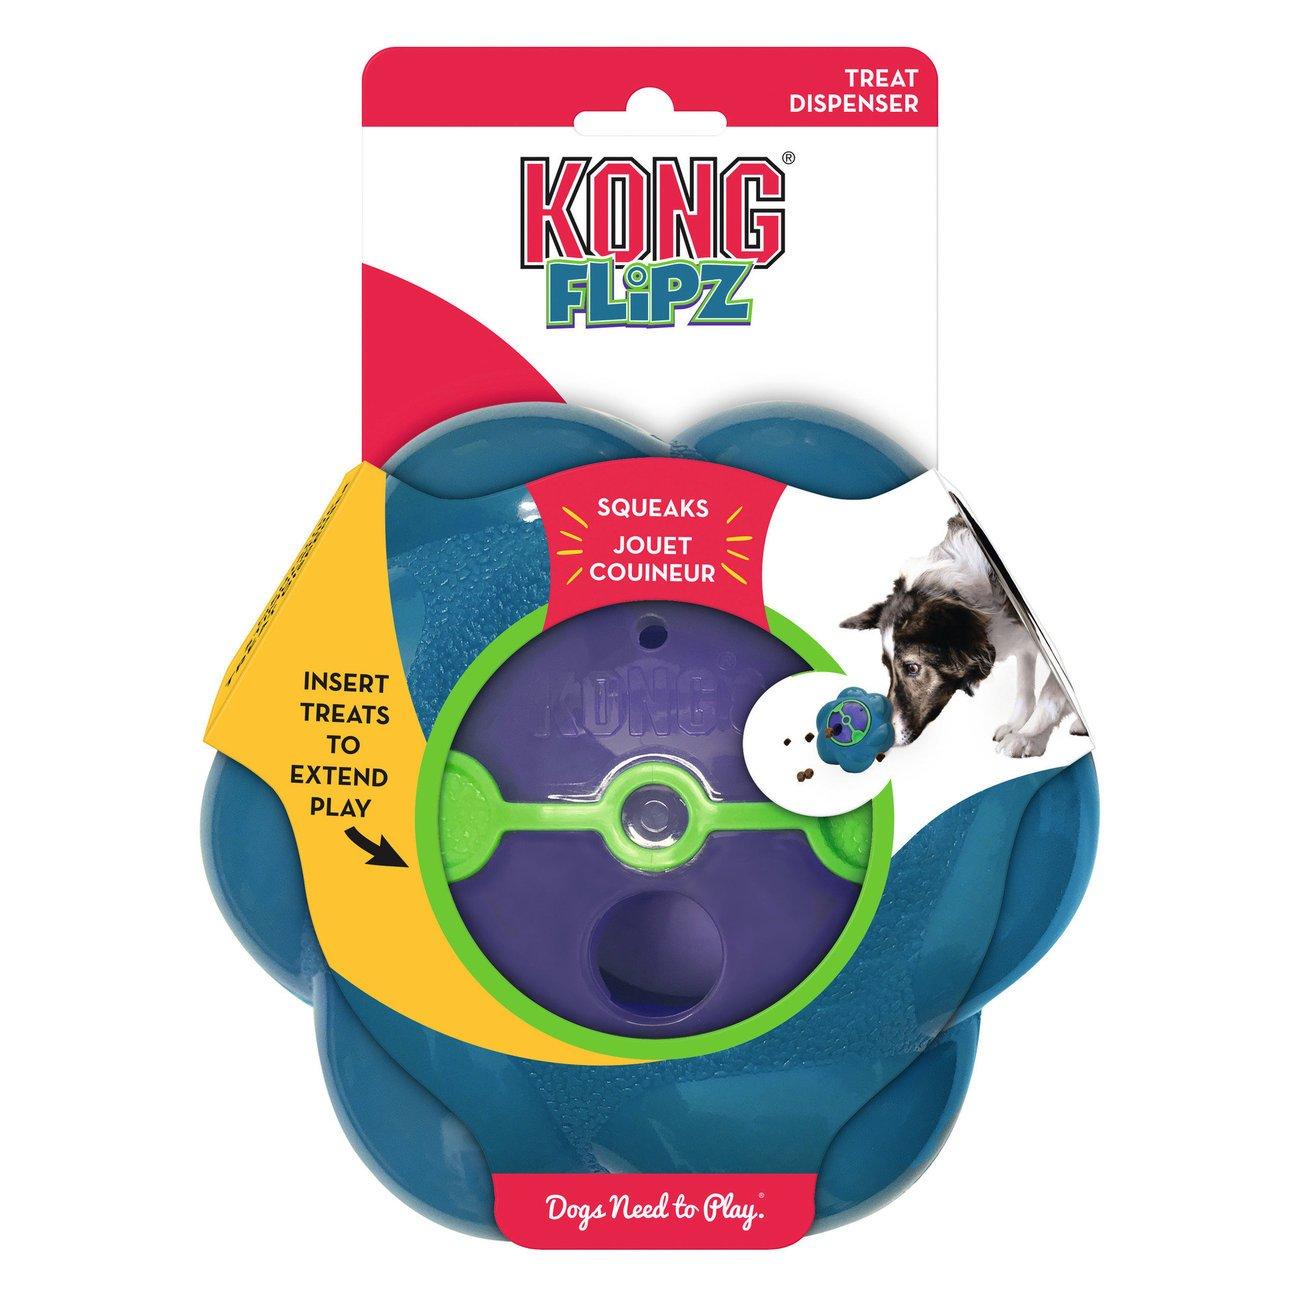 KONG Flipz Hundespielzeug, Bild 4